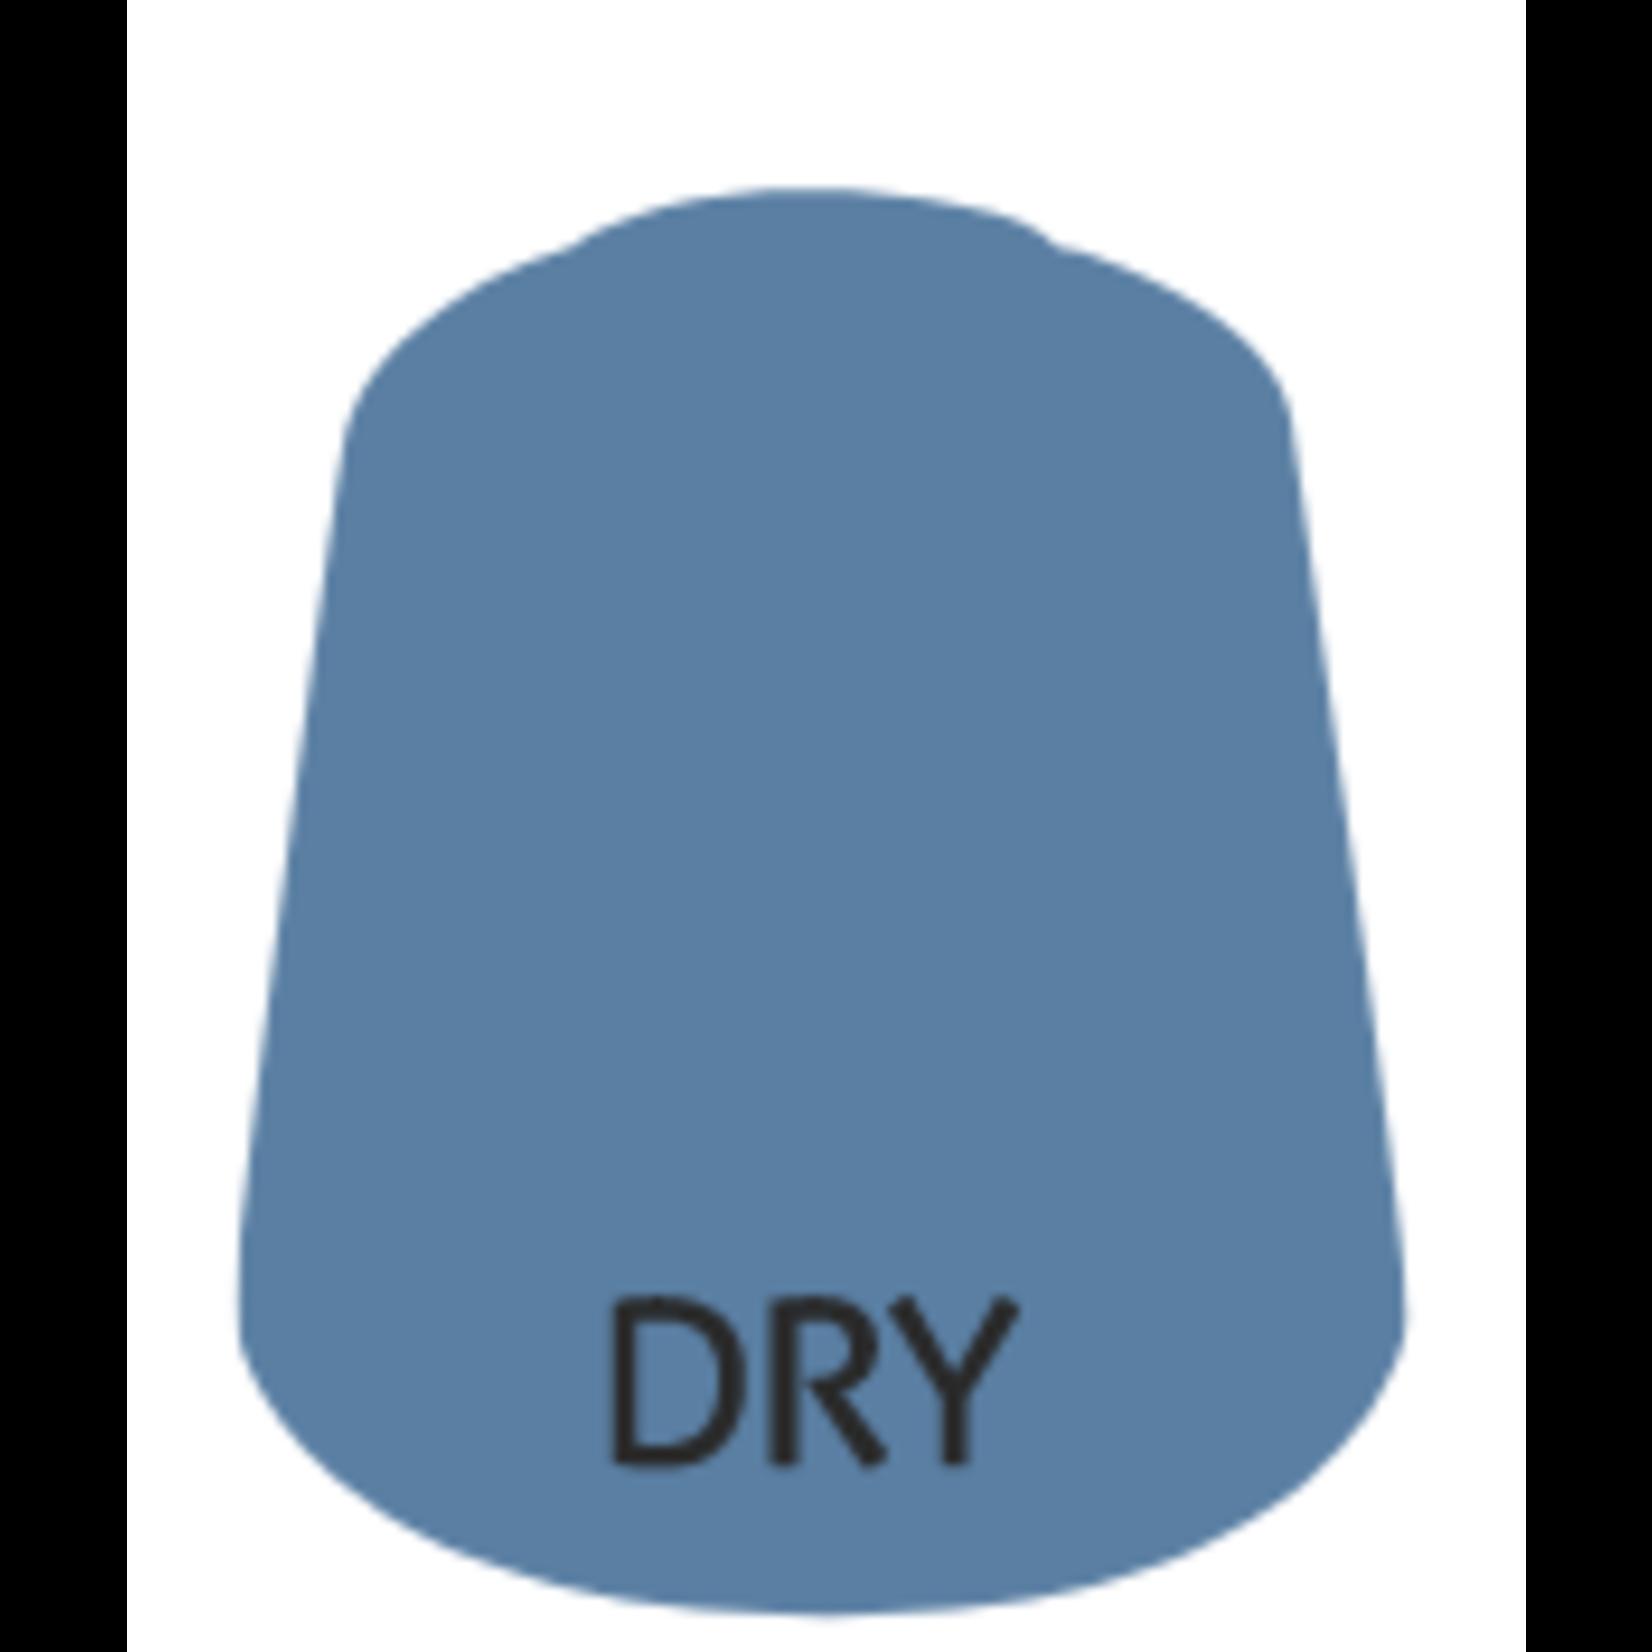 Games Workshop Dry: Stormfang (12ml) Paint